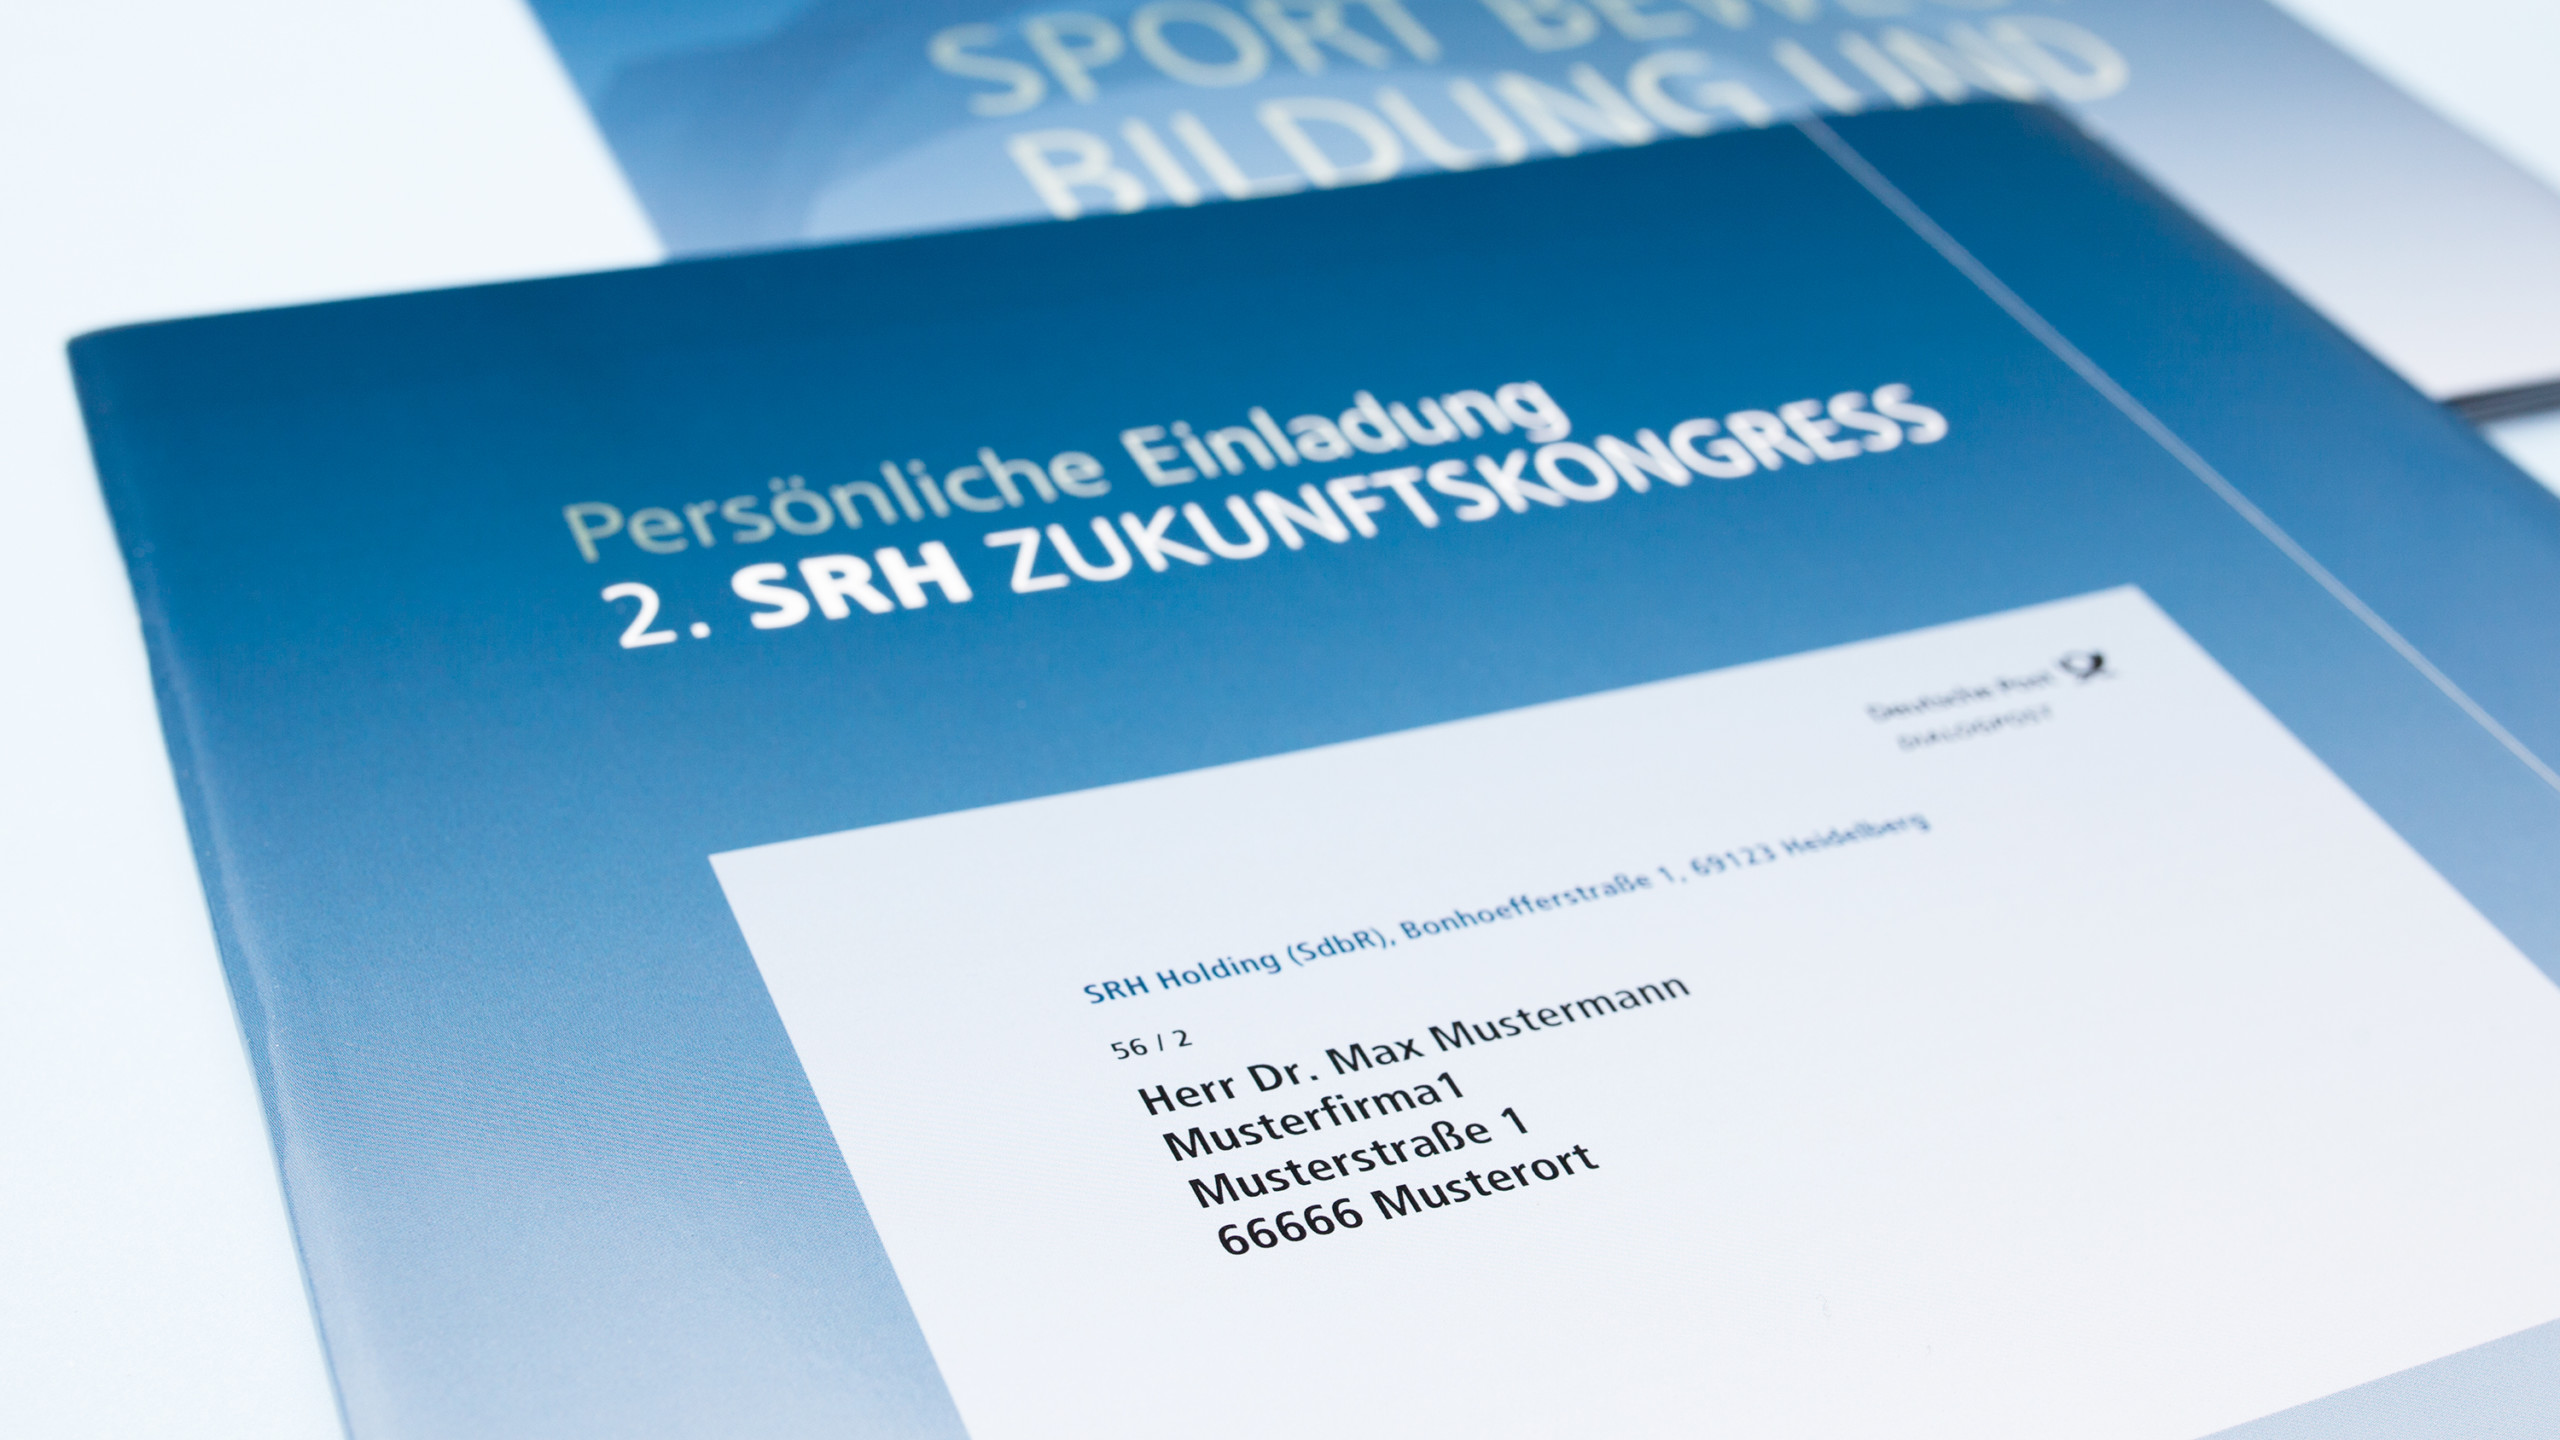 SRH Zukunftskongress, hochwertiger Selfmailer in Blau